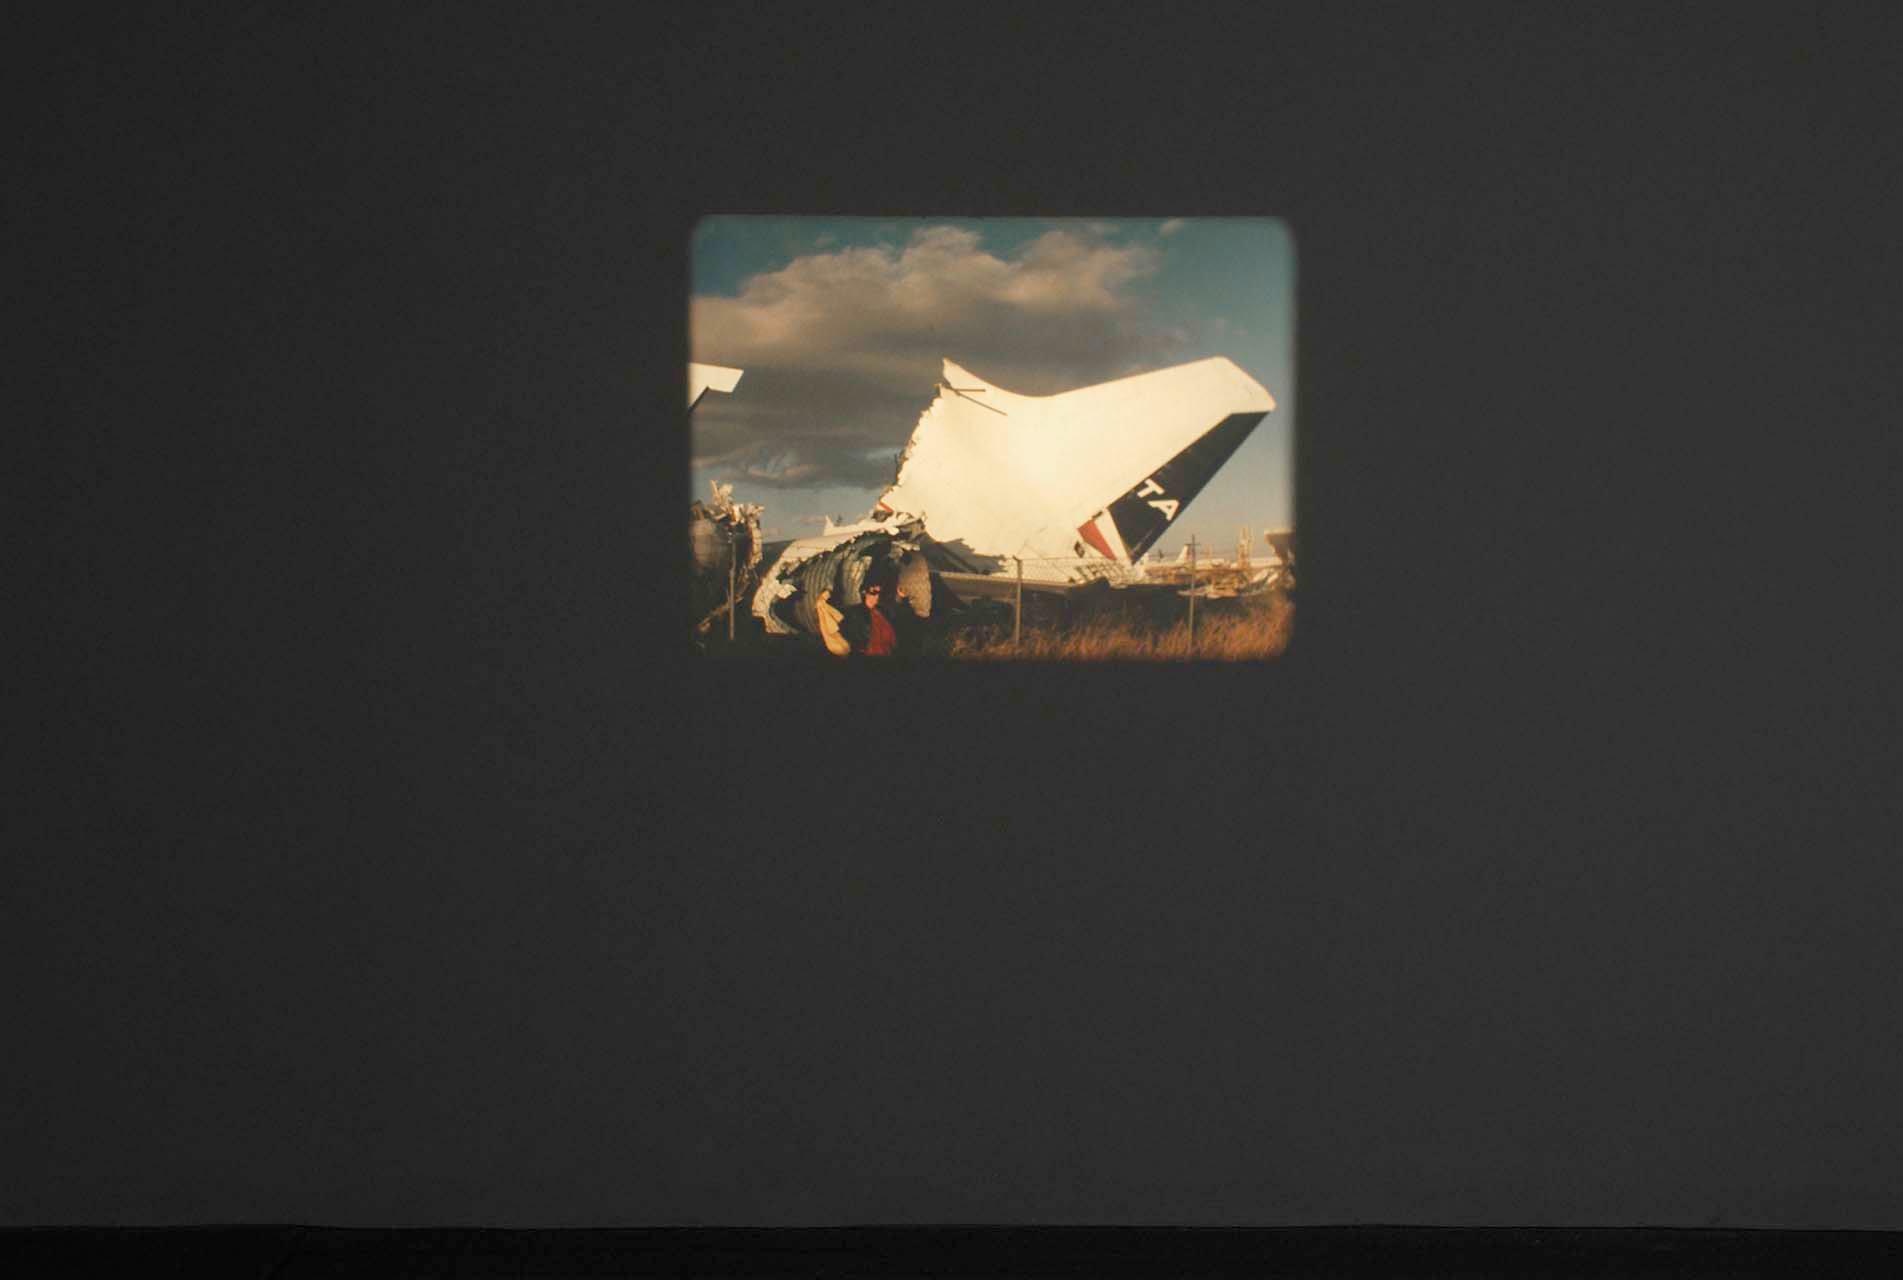 "<div class=""artwork_caption""><p>still from mojave, 2006</p></div>"